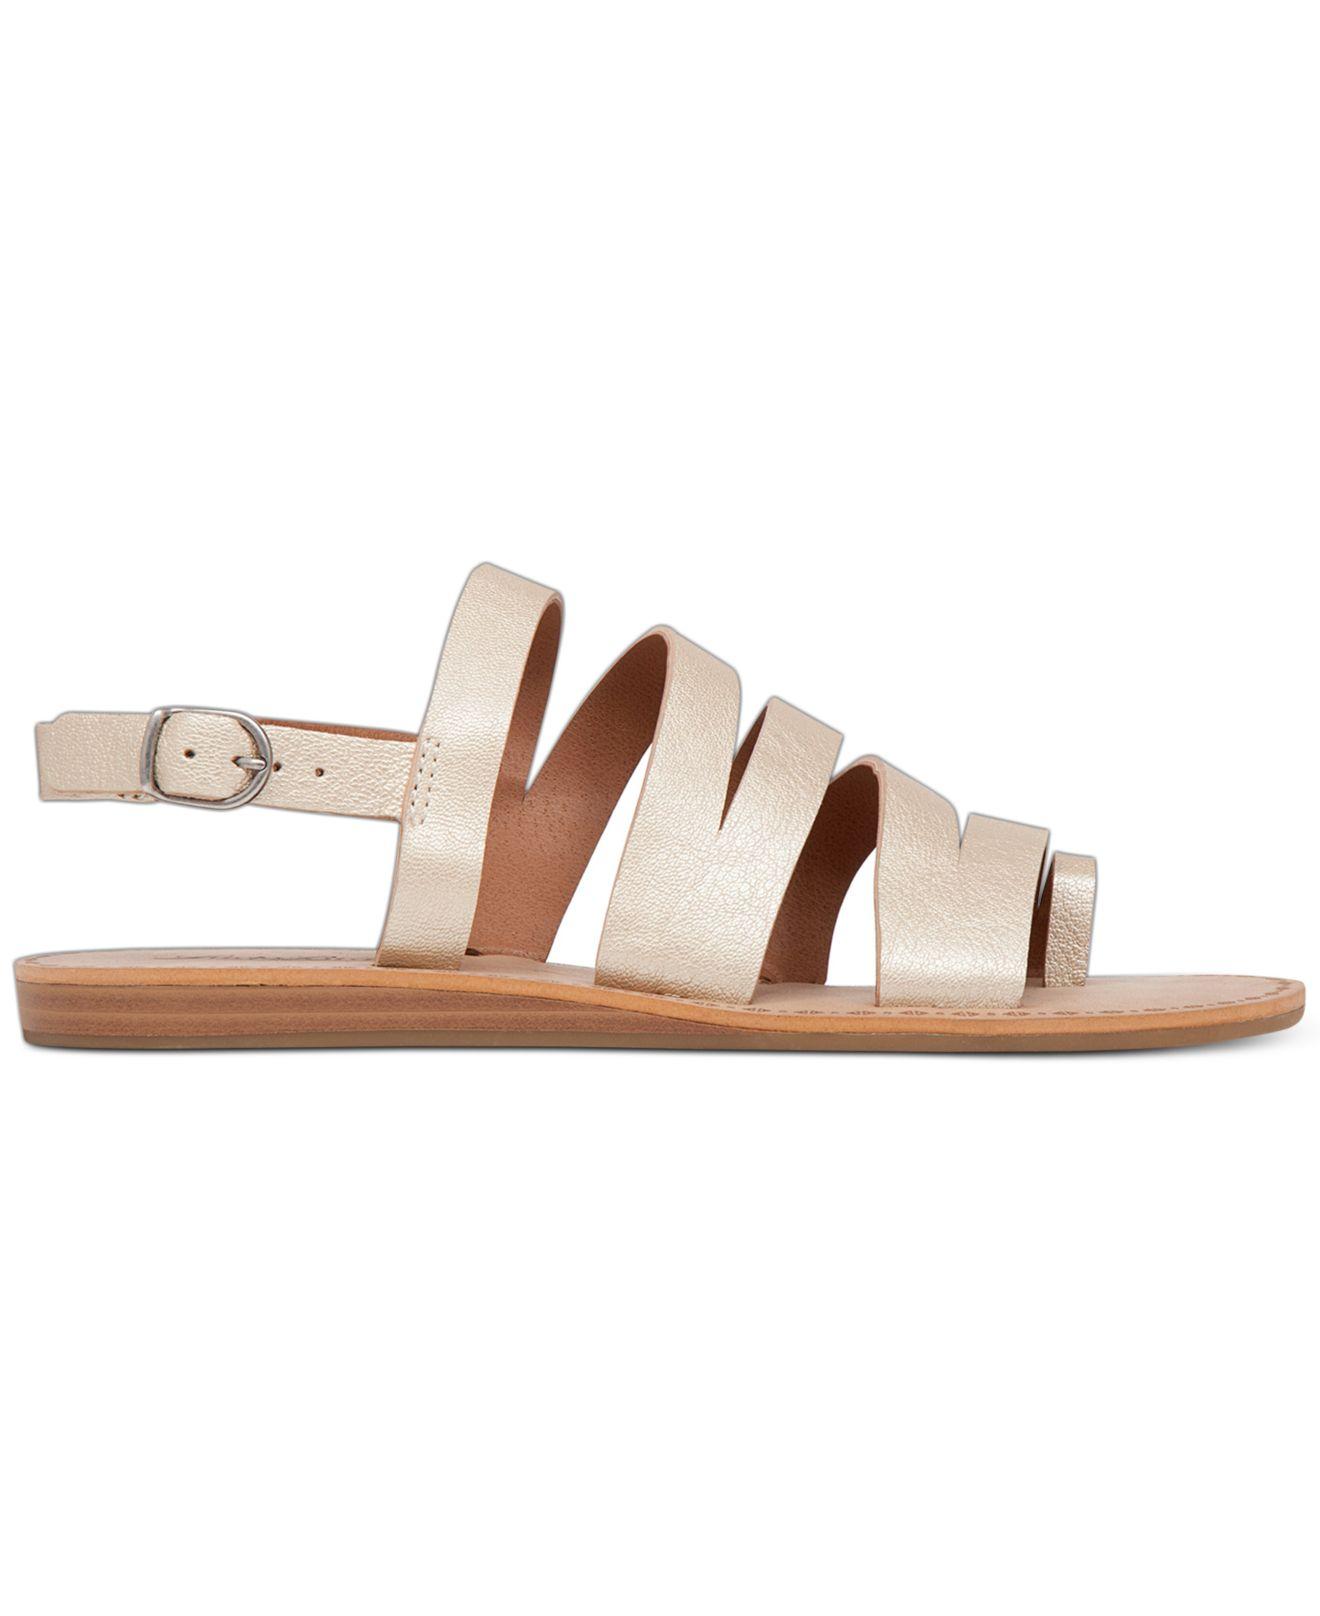 cb3a9dc202c Lyst - Lucky Brand Women s Fairfaxx Toe Thong Flat Sandals in Brown